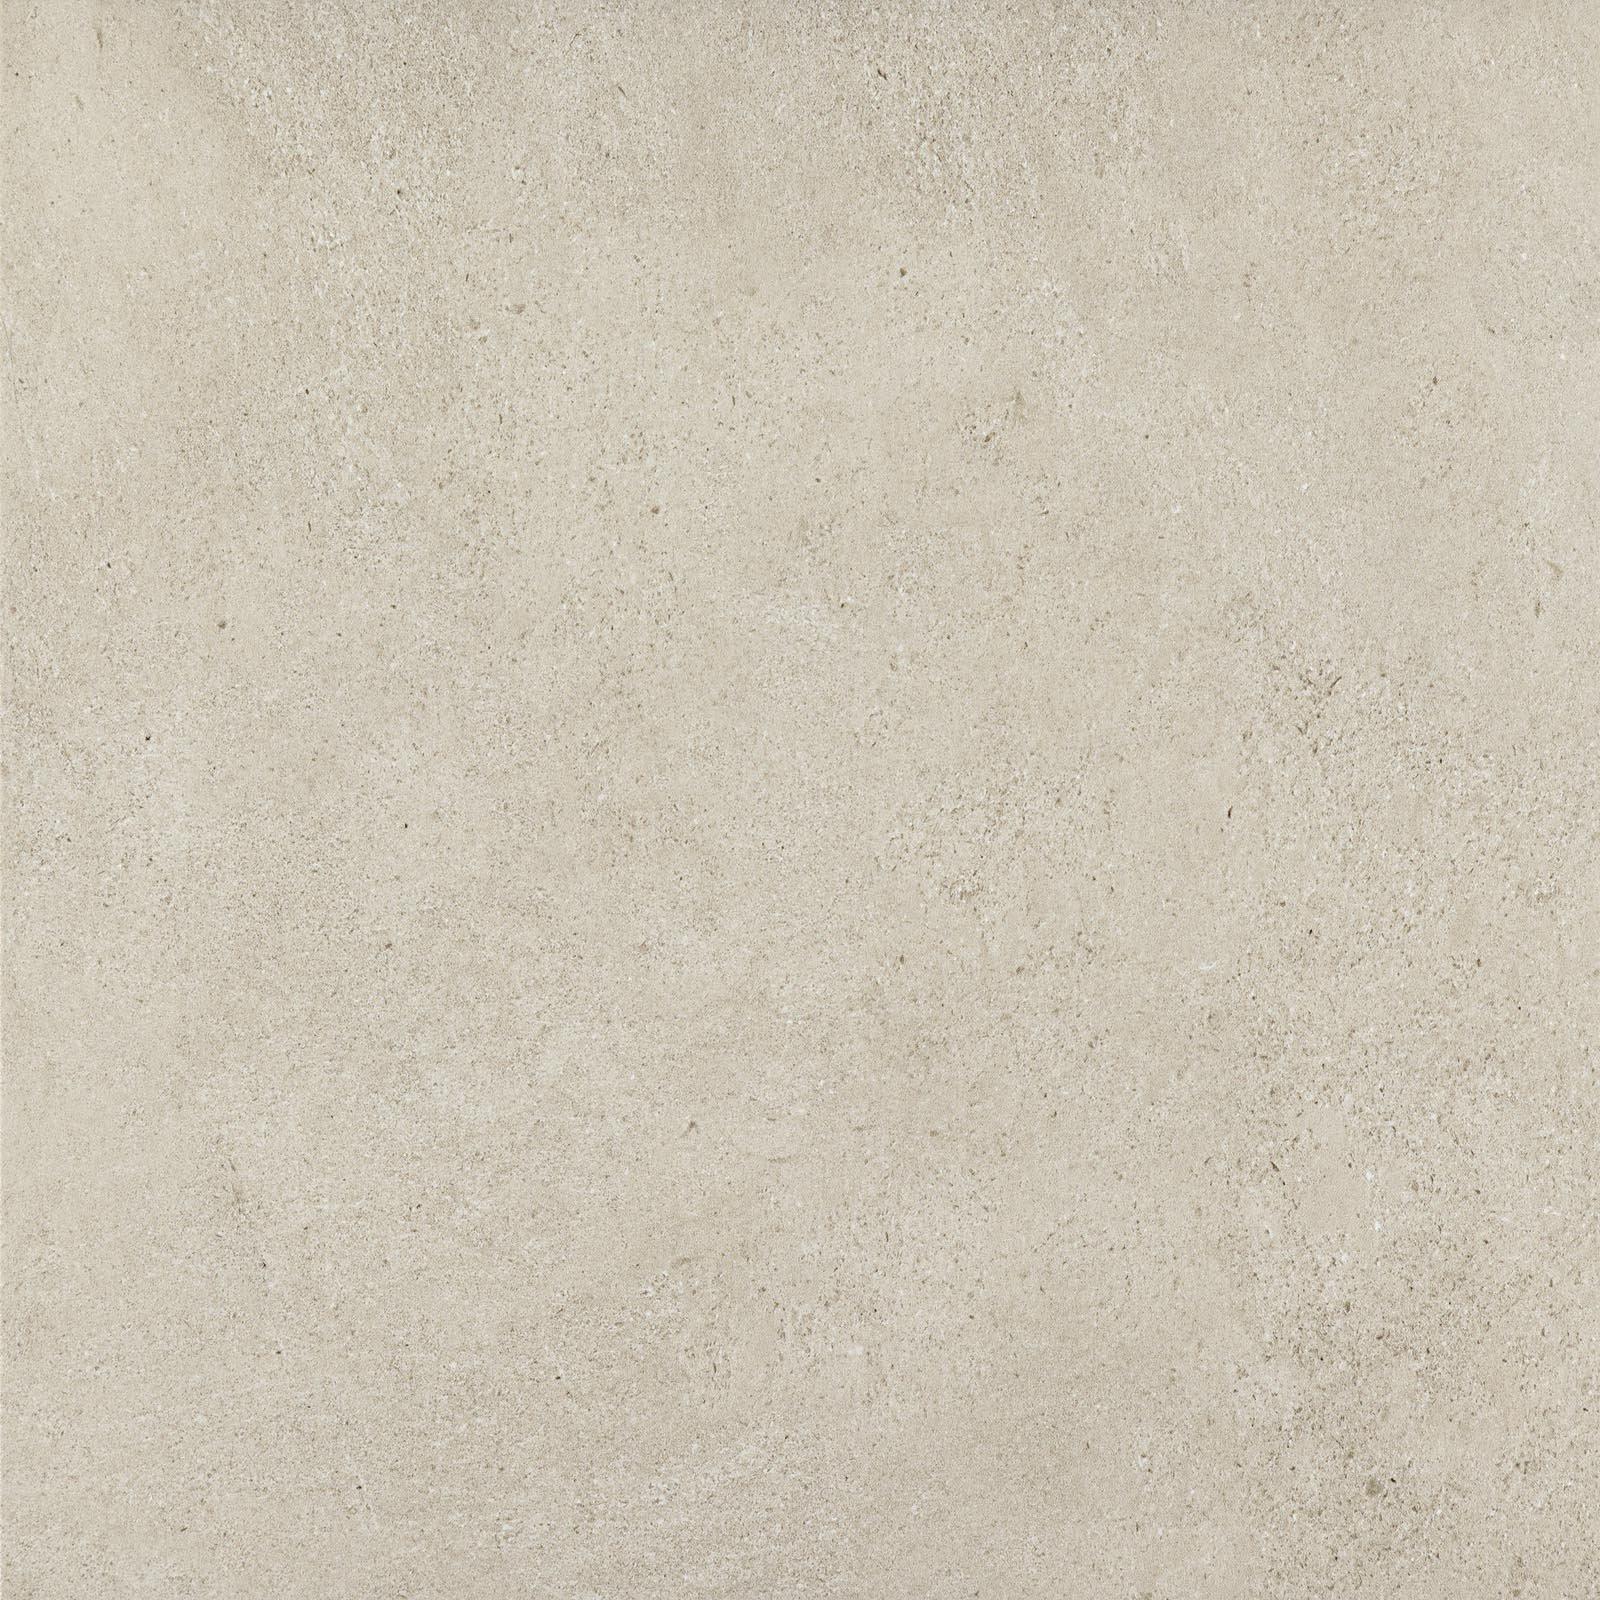 38b Stonework beige MLH8 R9 60x60 - Hansas Plaadimaailm